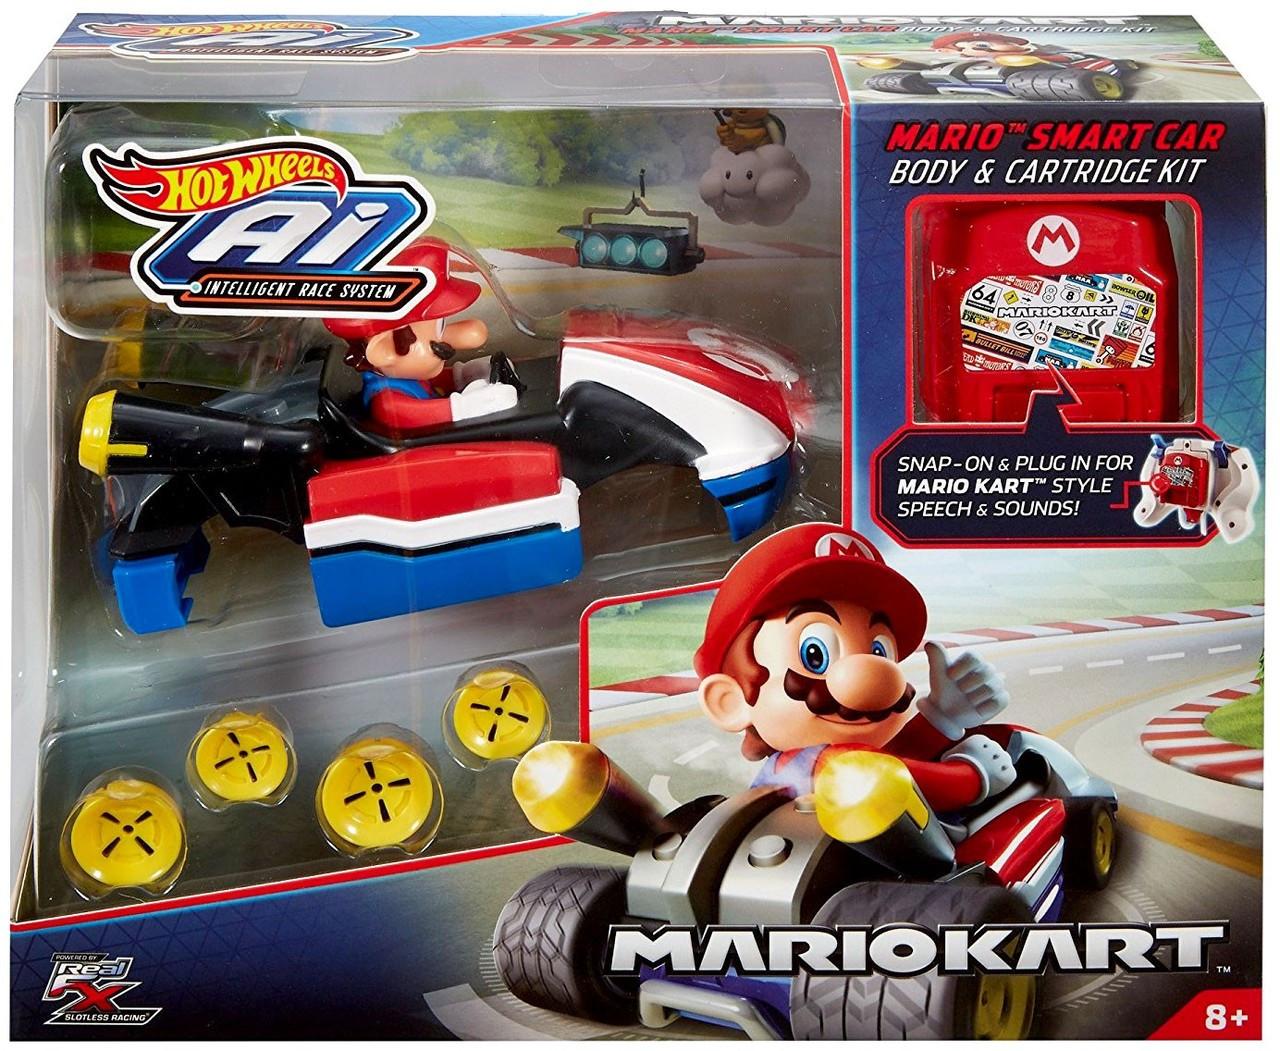 Mario Kart Hot Wheels AI Intelligent Race System Mario Smart Car Body &  Cartridge Kit